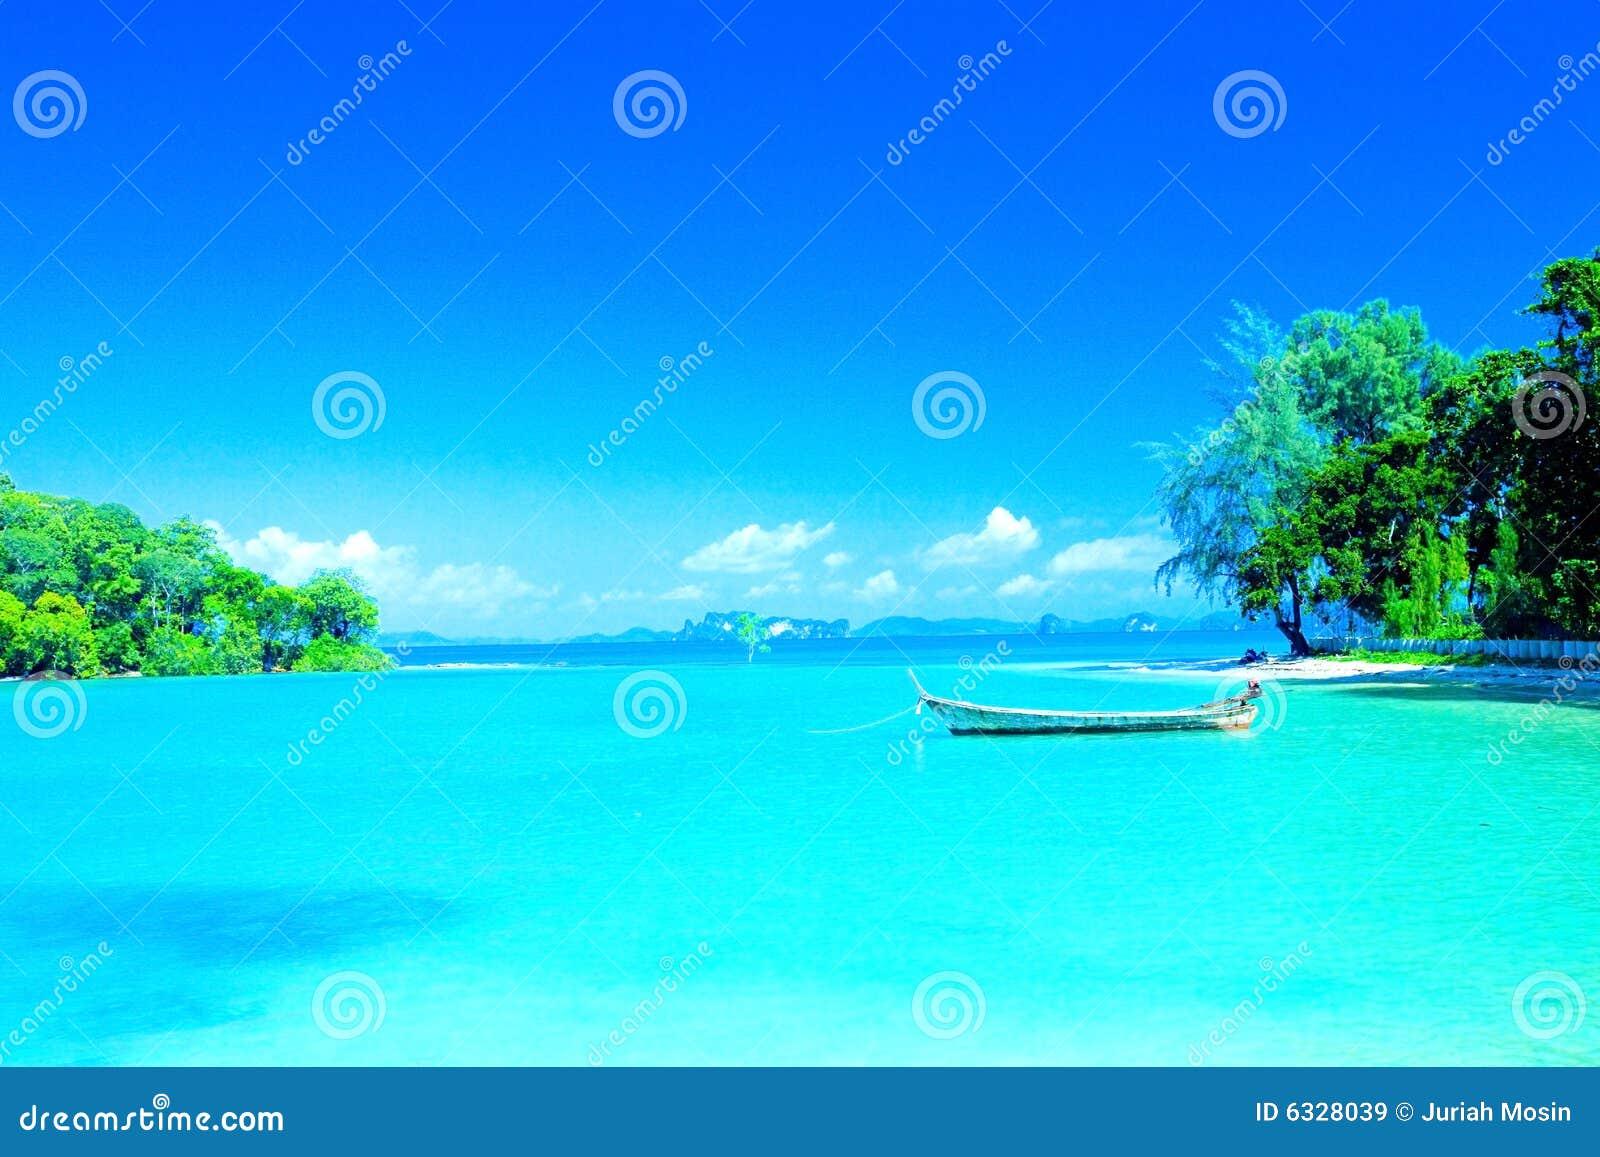 Lagune strand in toevluchtbaai van Krabi, Thailand.